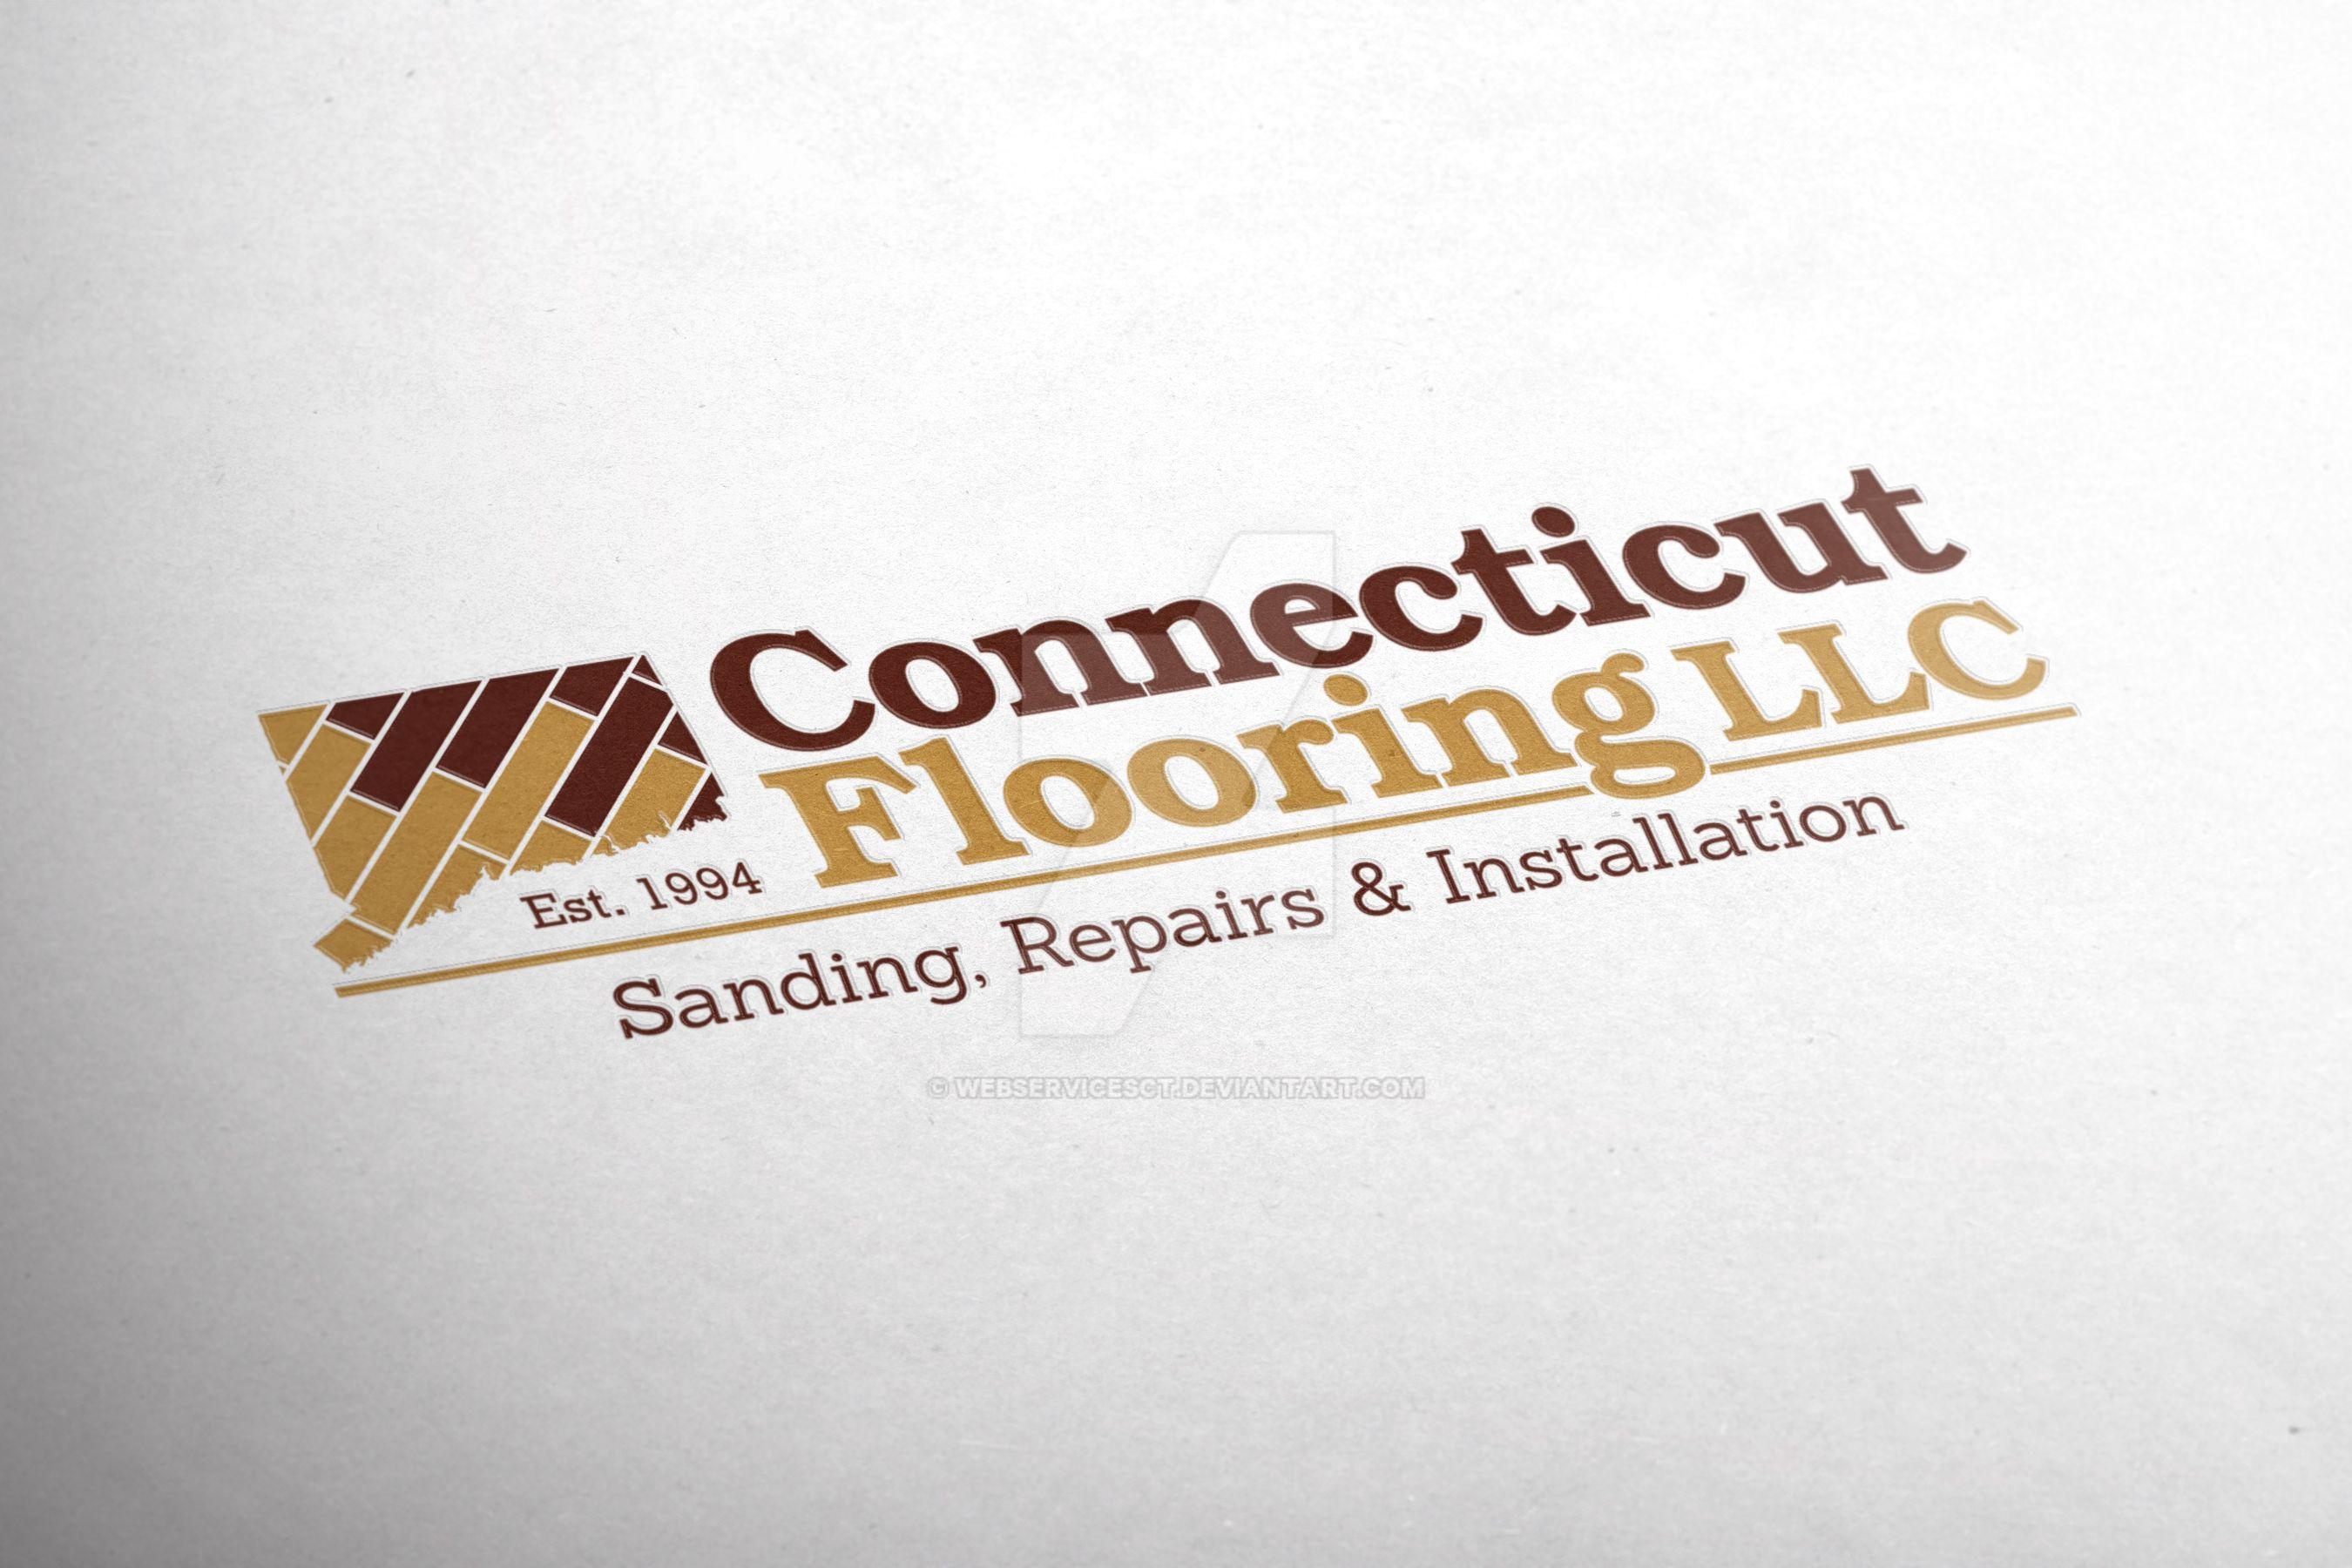 Flooring Services Logo : Flooring logo design by web services ct webservicesct